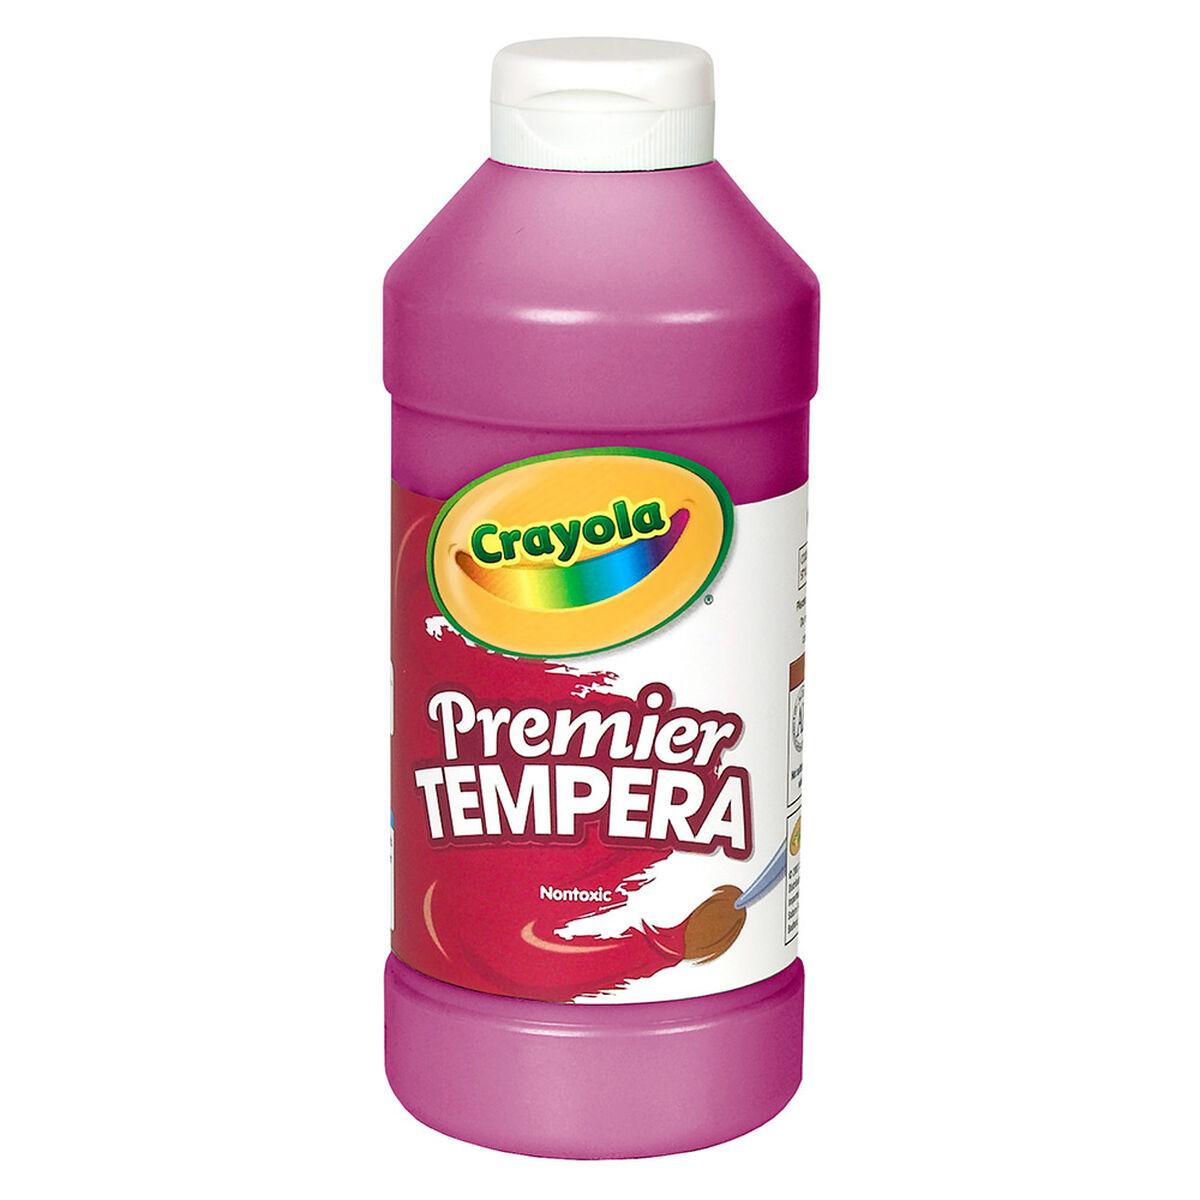 Premier Tempera Paint 16-oz.-Choose Your Color - Crayola